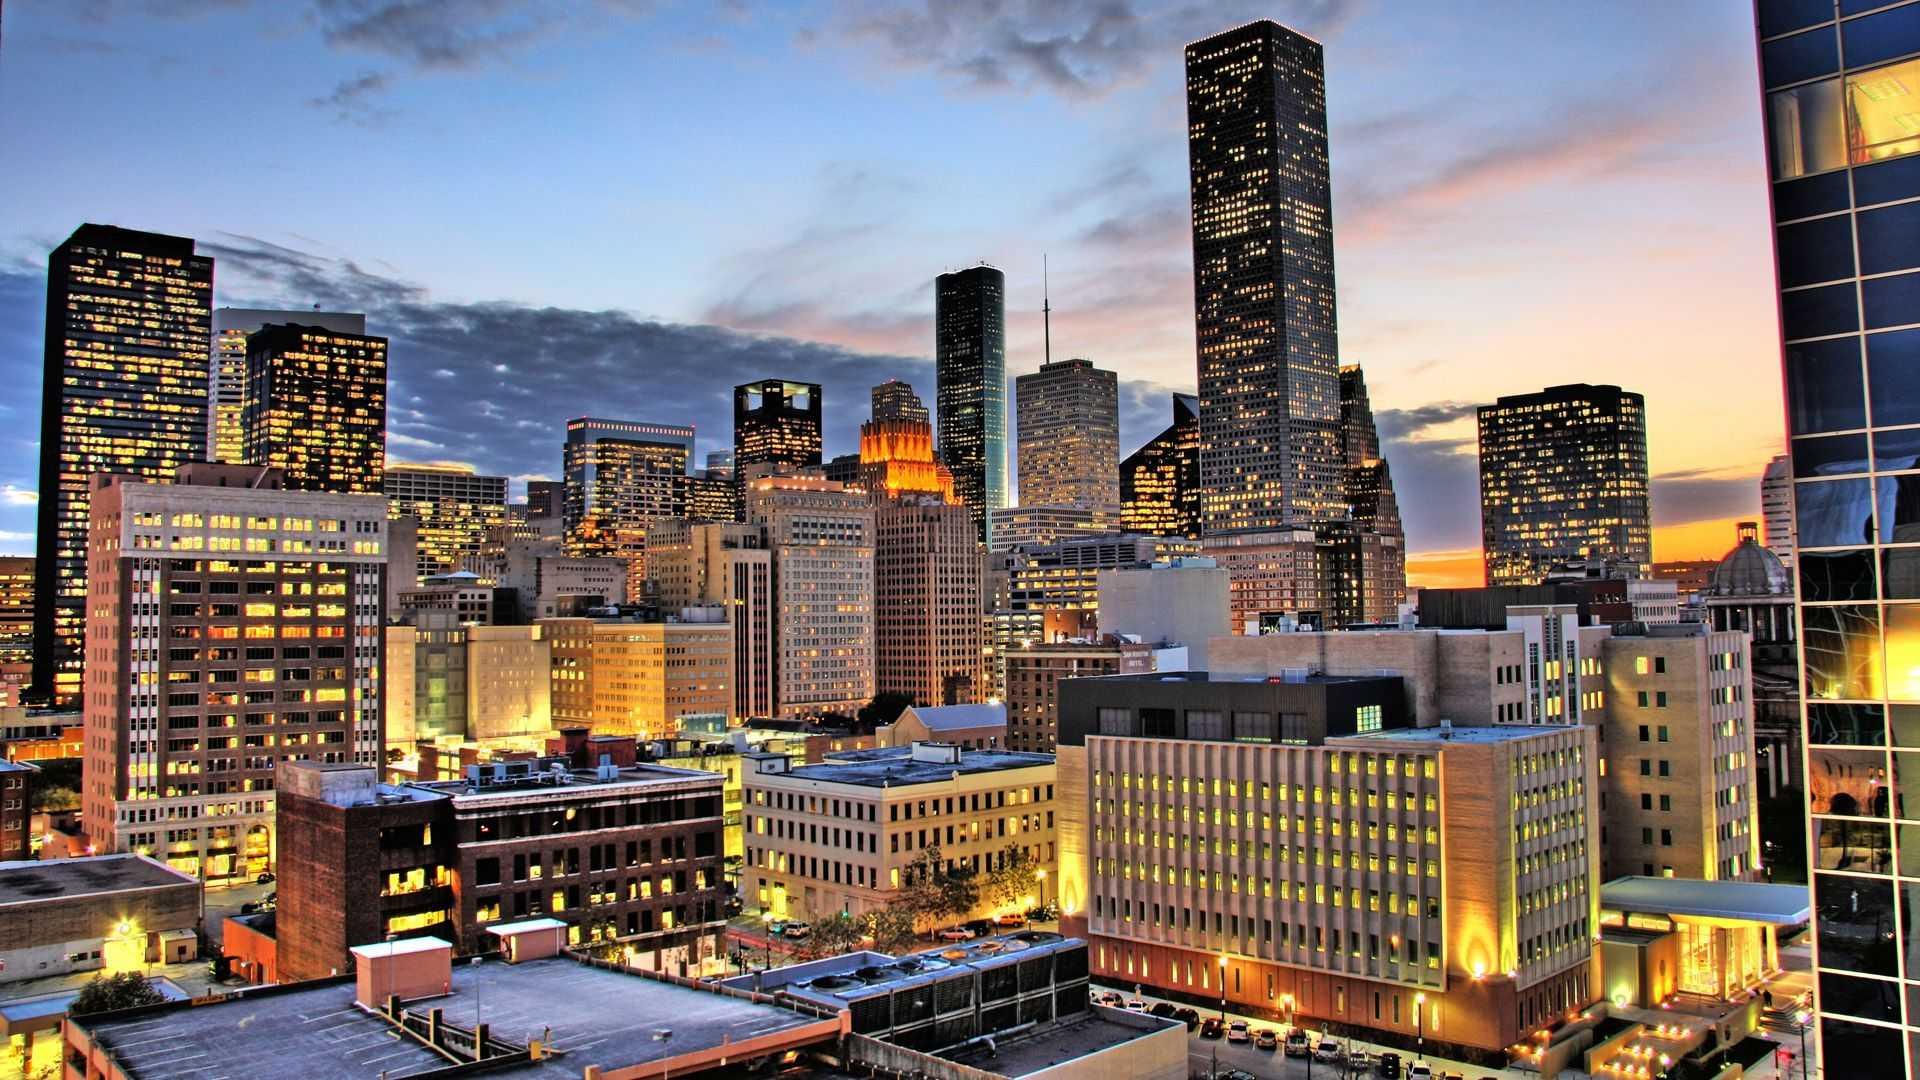 George Bush Intercontinental Airport (IAH) | Rides to IAH | IAH Pickup-Houston